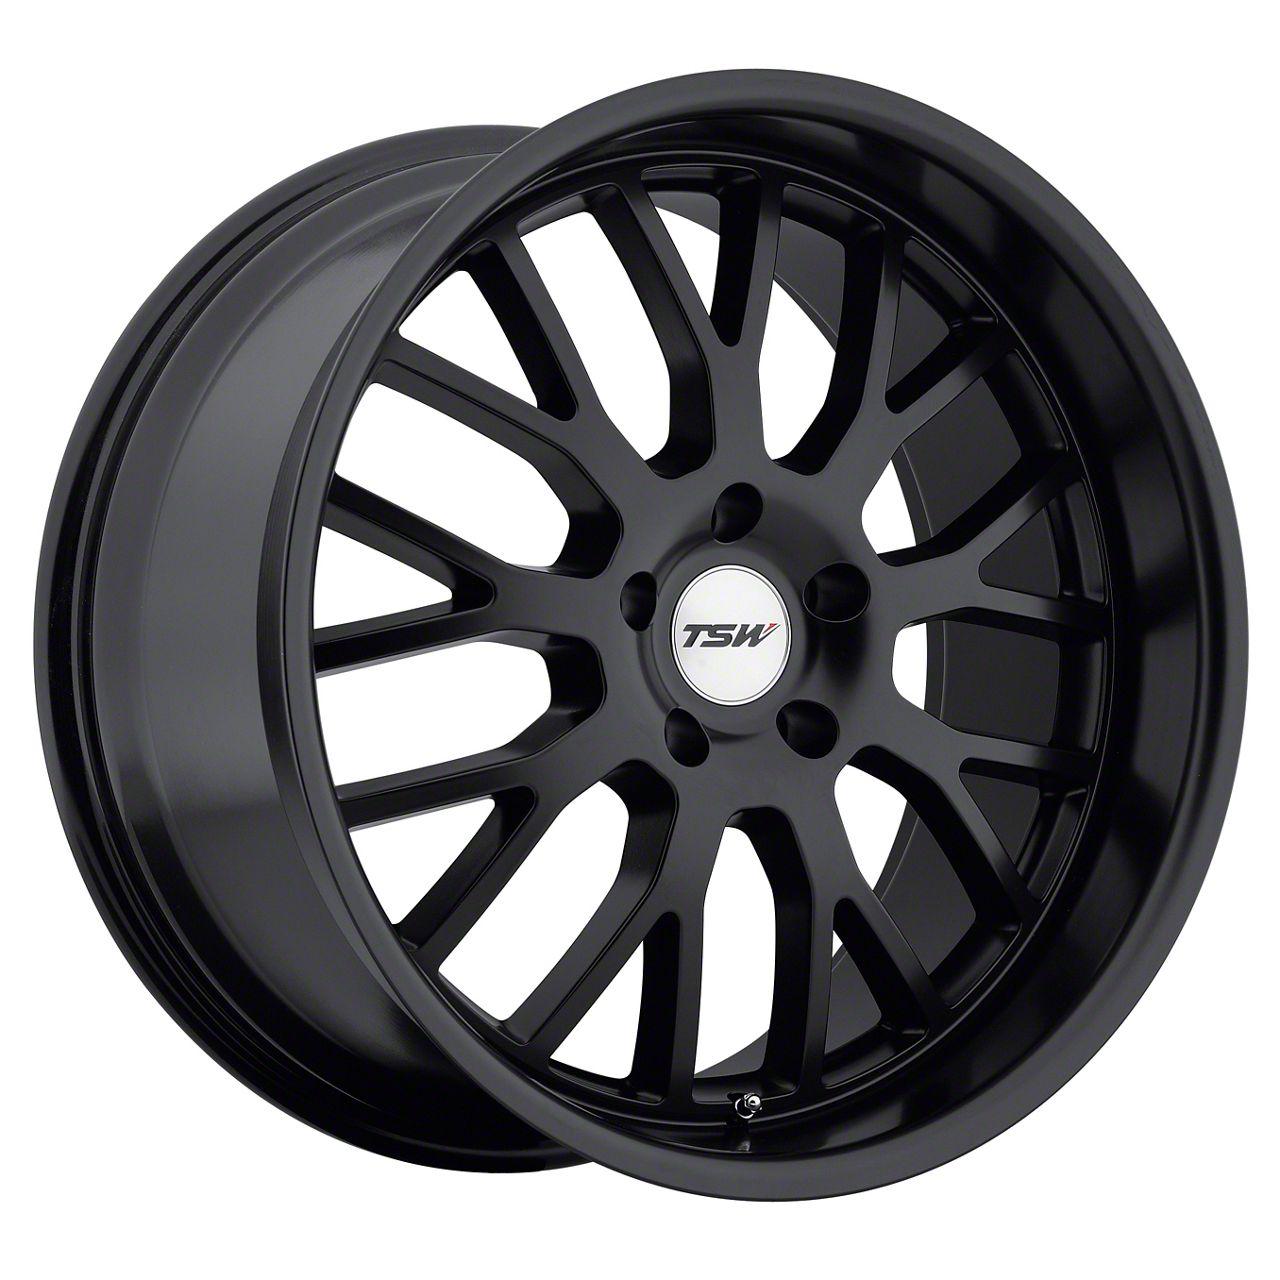 TSW Tremblant Matte Black Wheel - 20x8.5 (15-19 All)